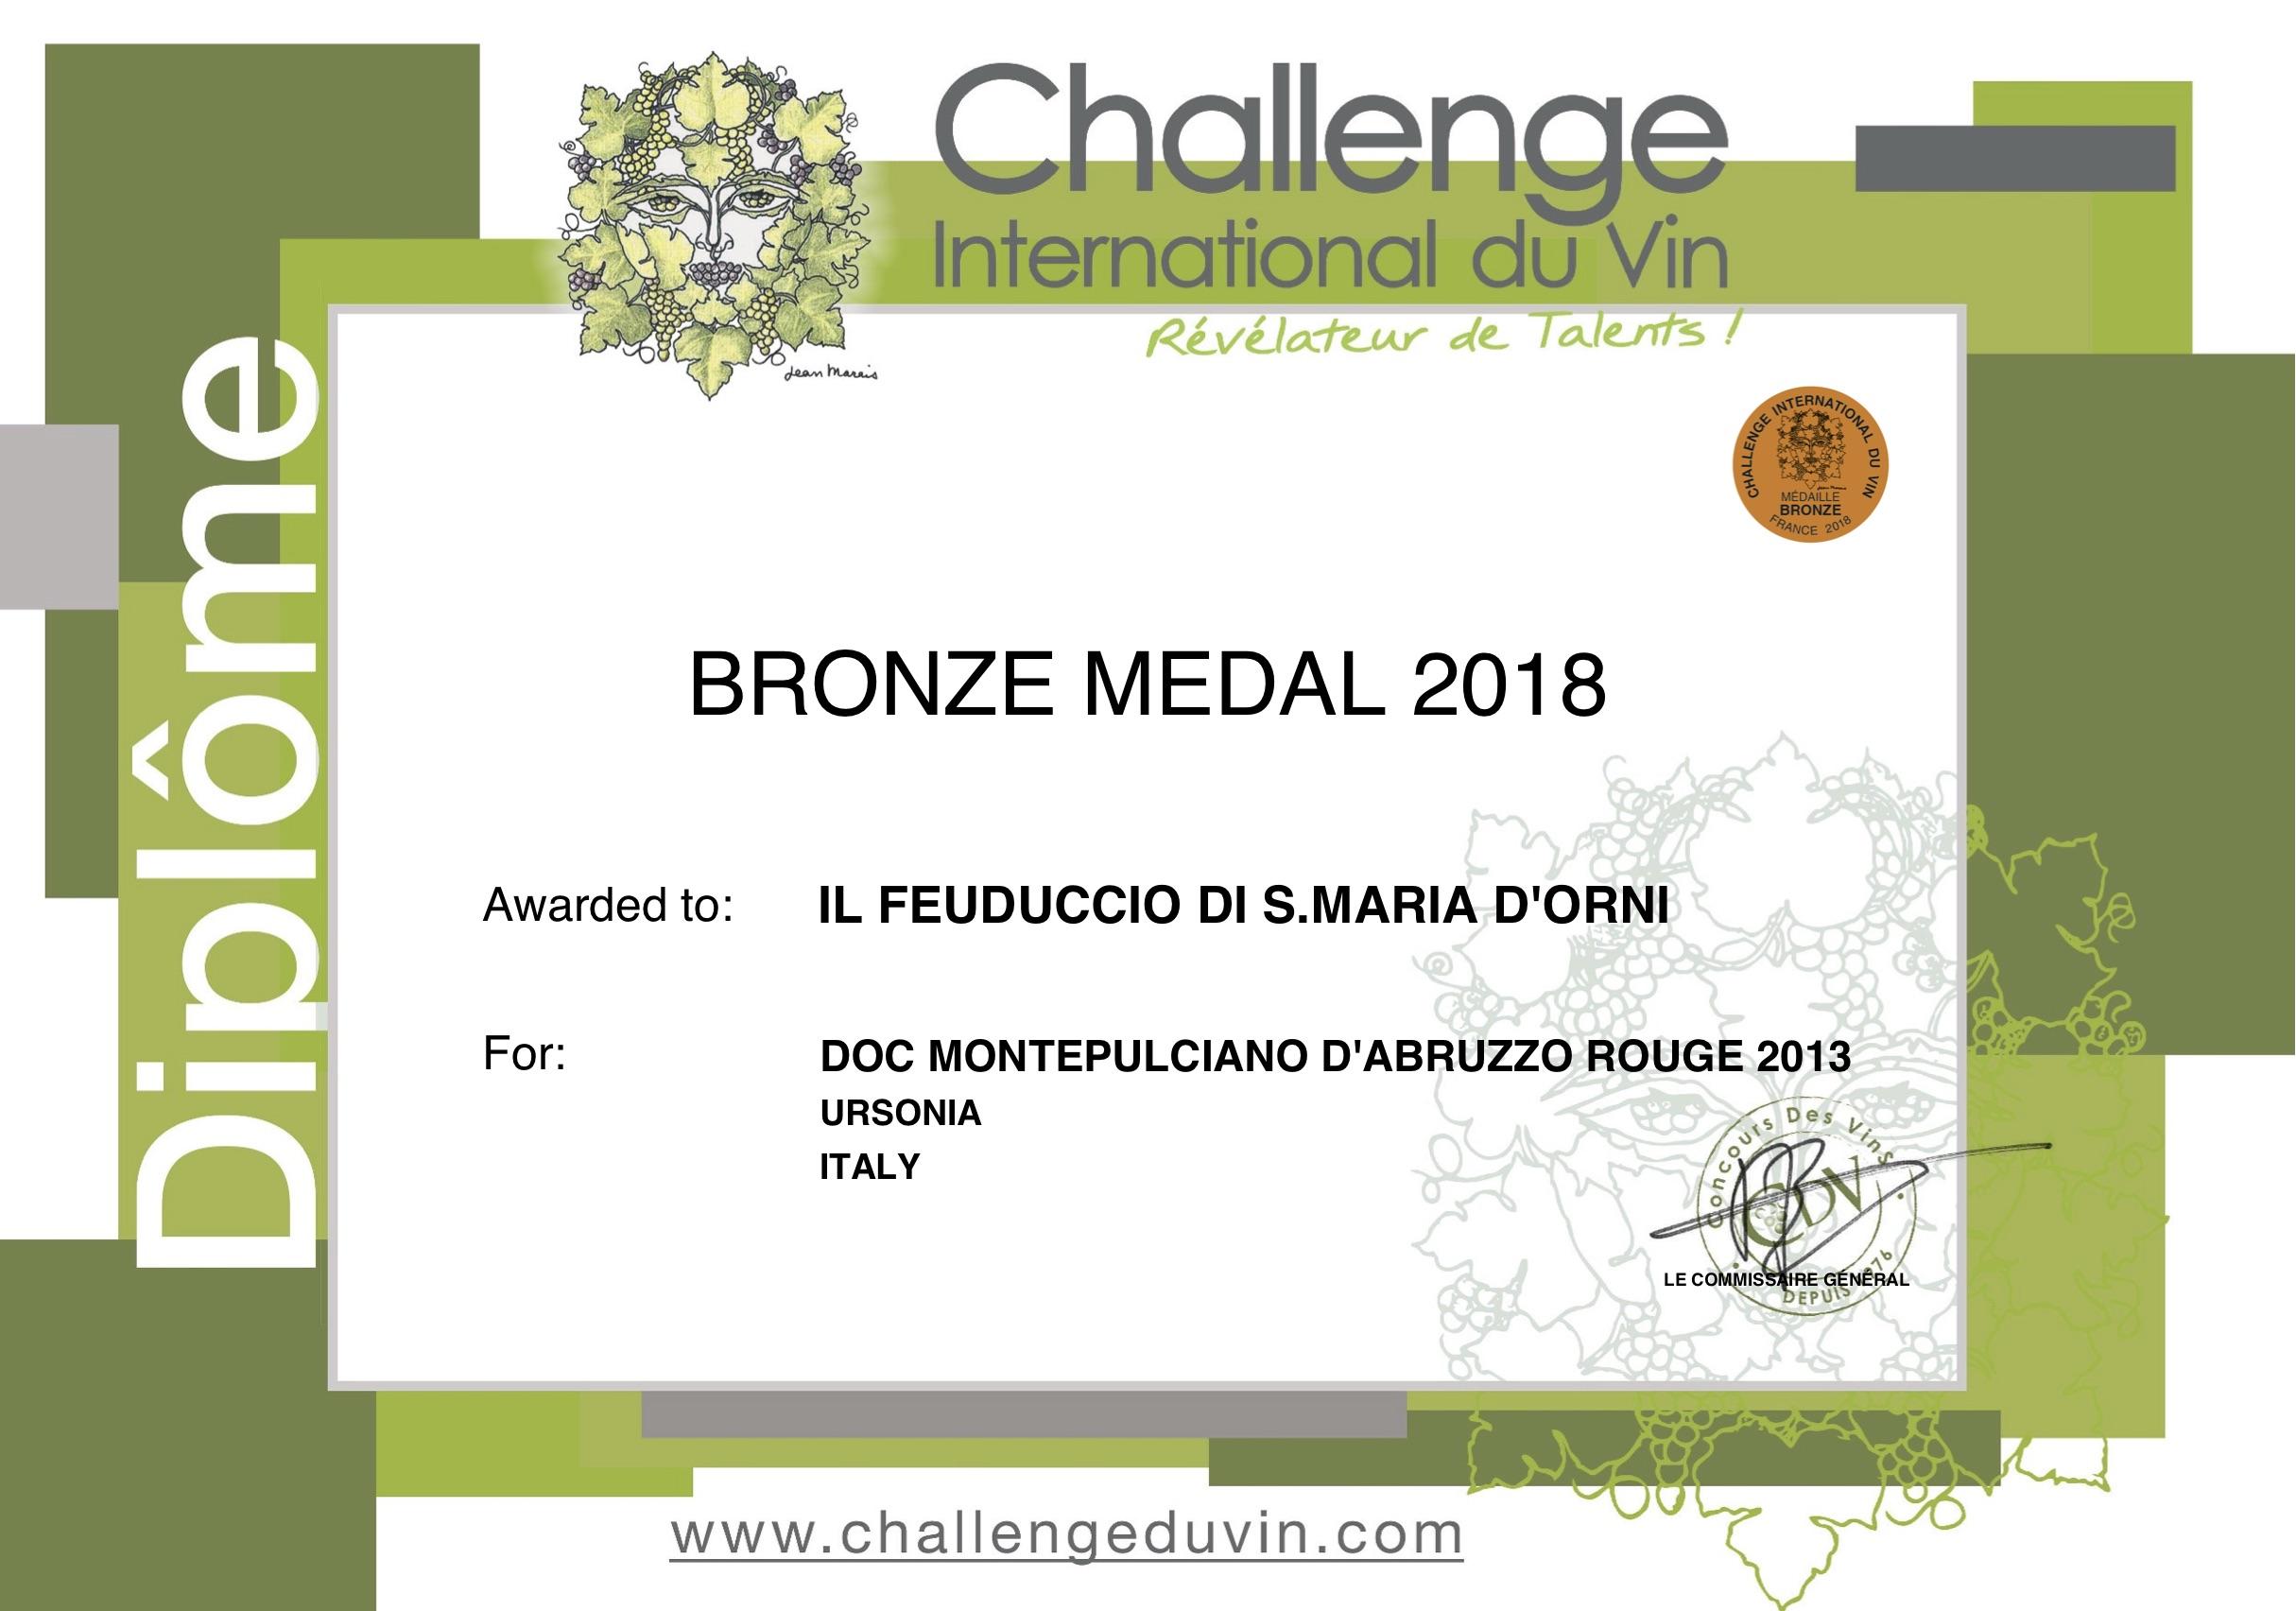 Le Challenge International du Vin 2018_diplomi.jpg